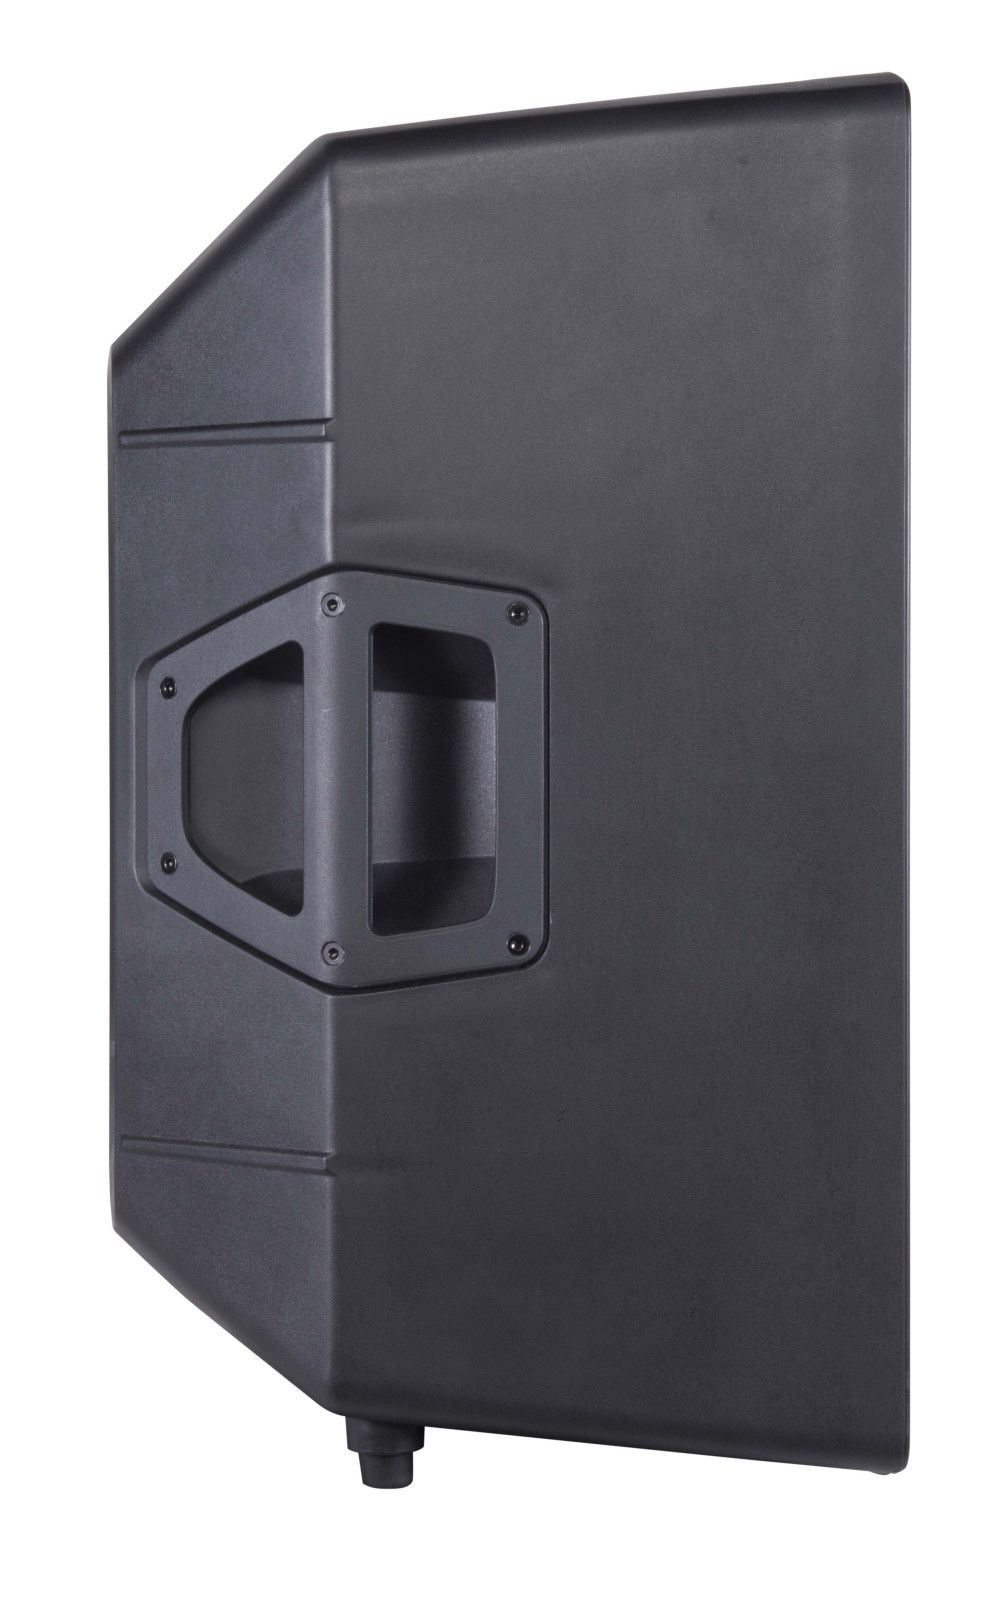 "Caixa Acústica Portátil 12"" - Ativa - 500W RMS - FLASH12XD - PROEL"